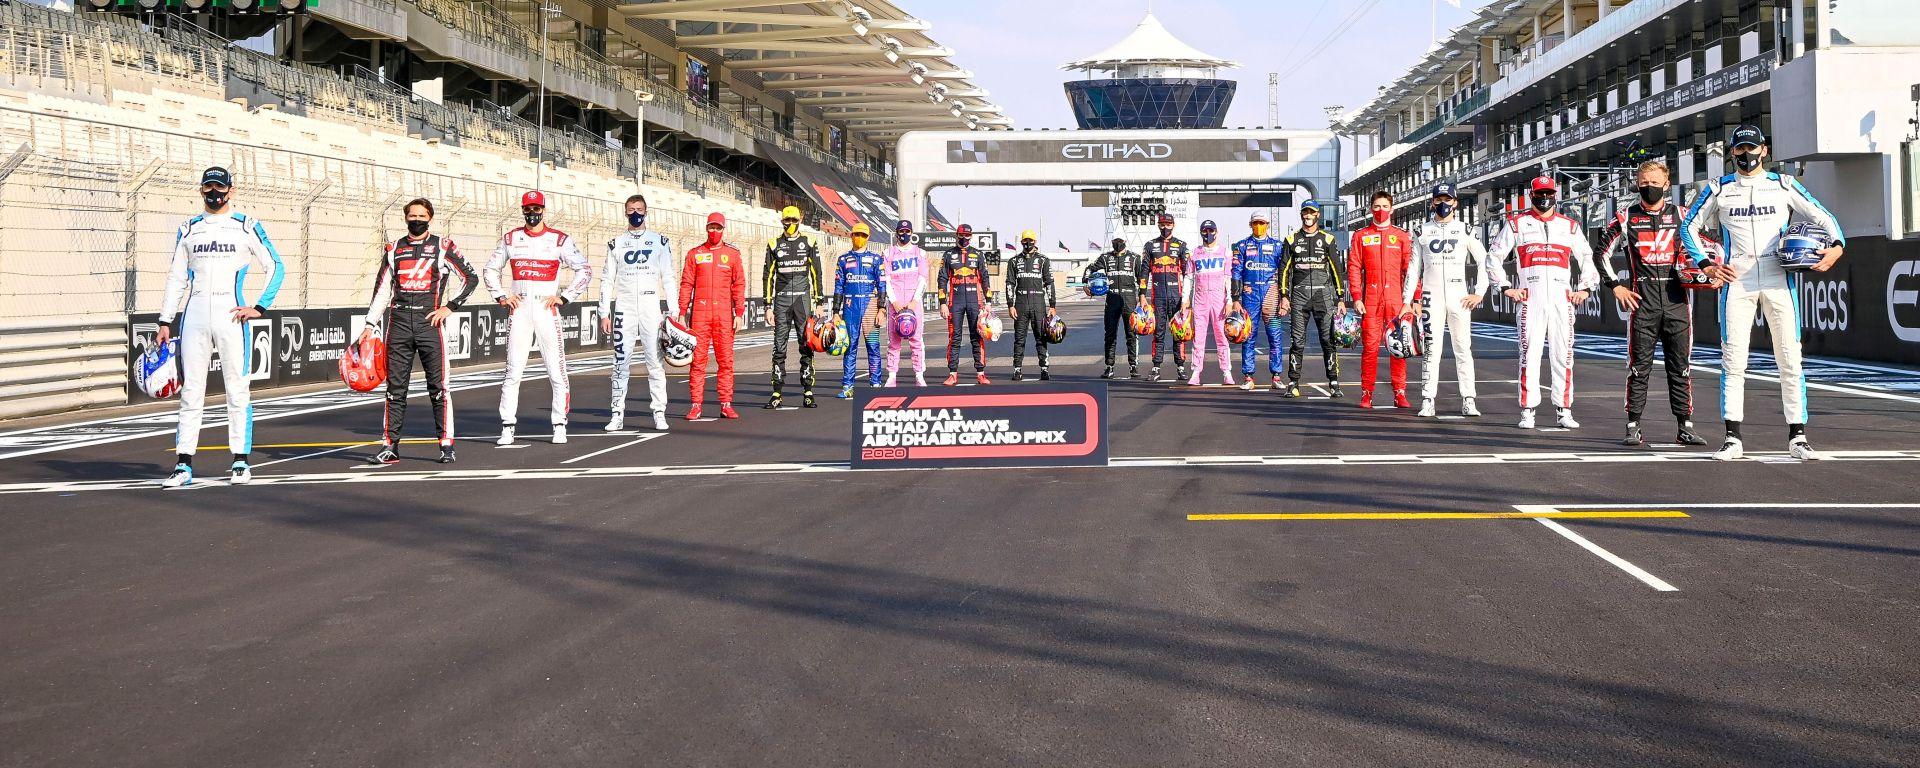 F1 GP Abu Dhabi 2020, Yas Marina: foto di gruppo dei piloti in griglia